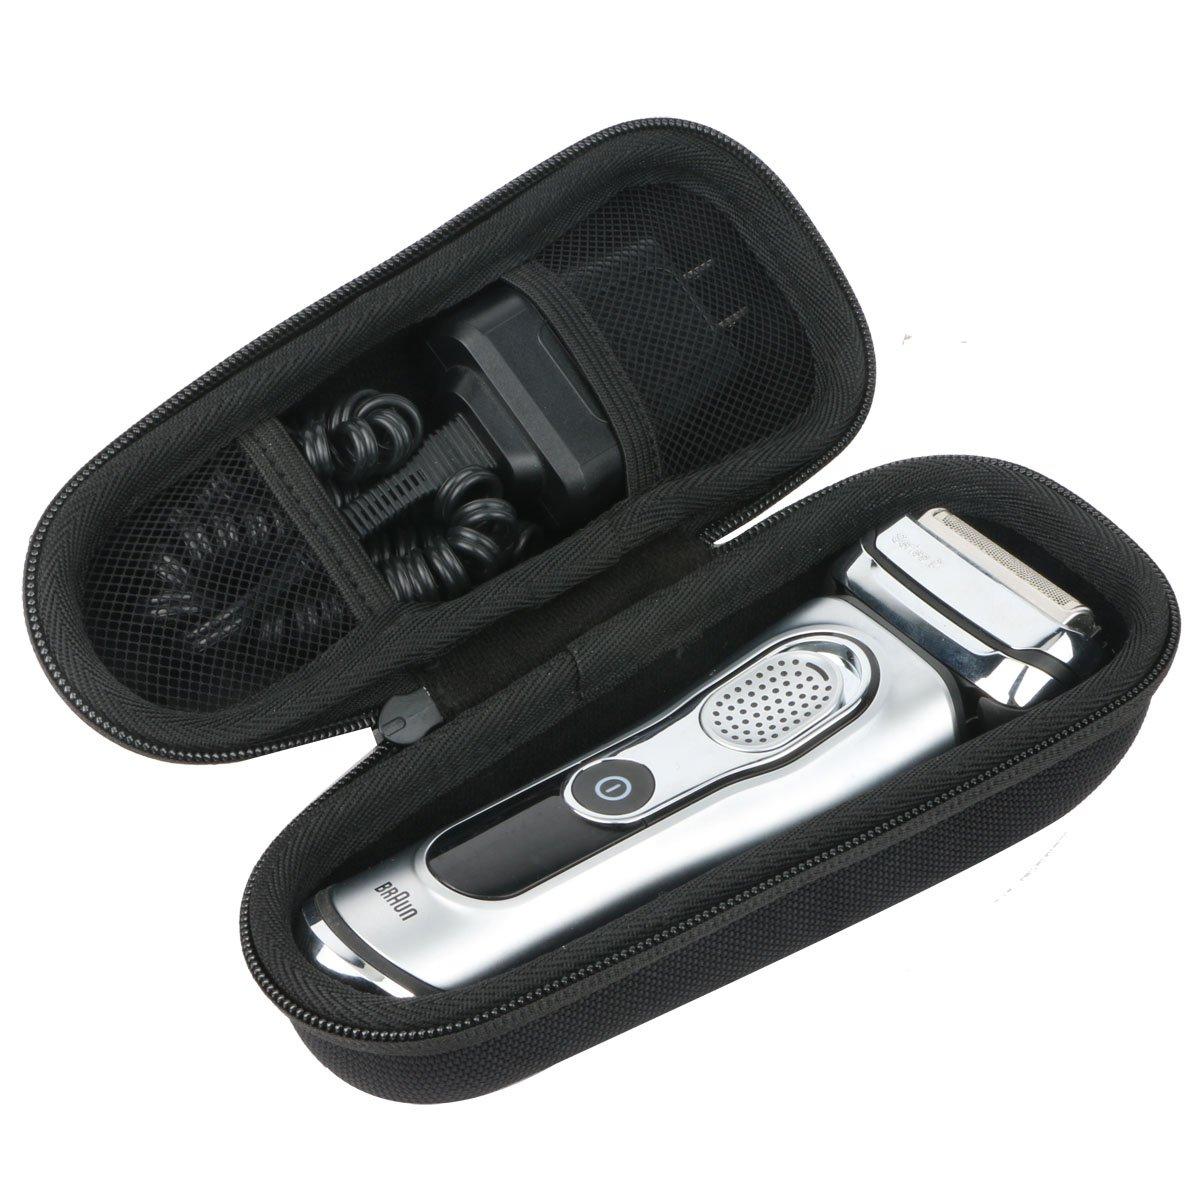 Khanka EVA Borsa da viaggio Custodia caso scatola per Braun Series 5 5070CC 5030S Rasoio Elettrico a